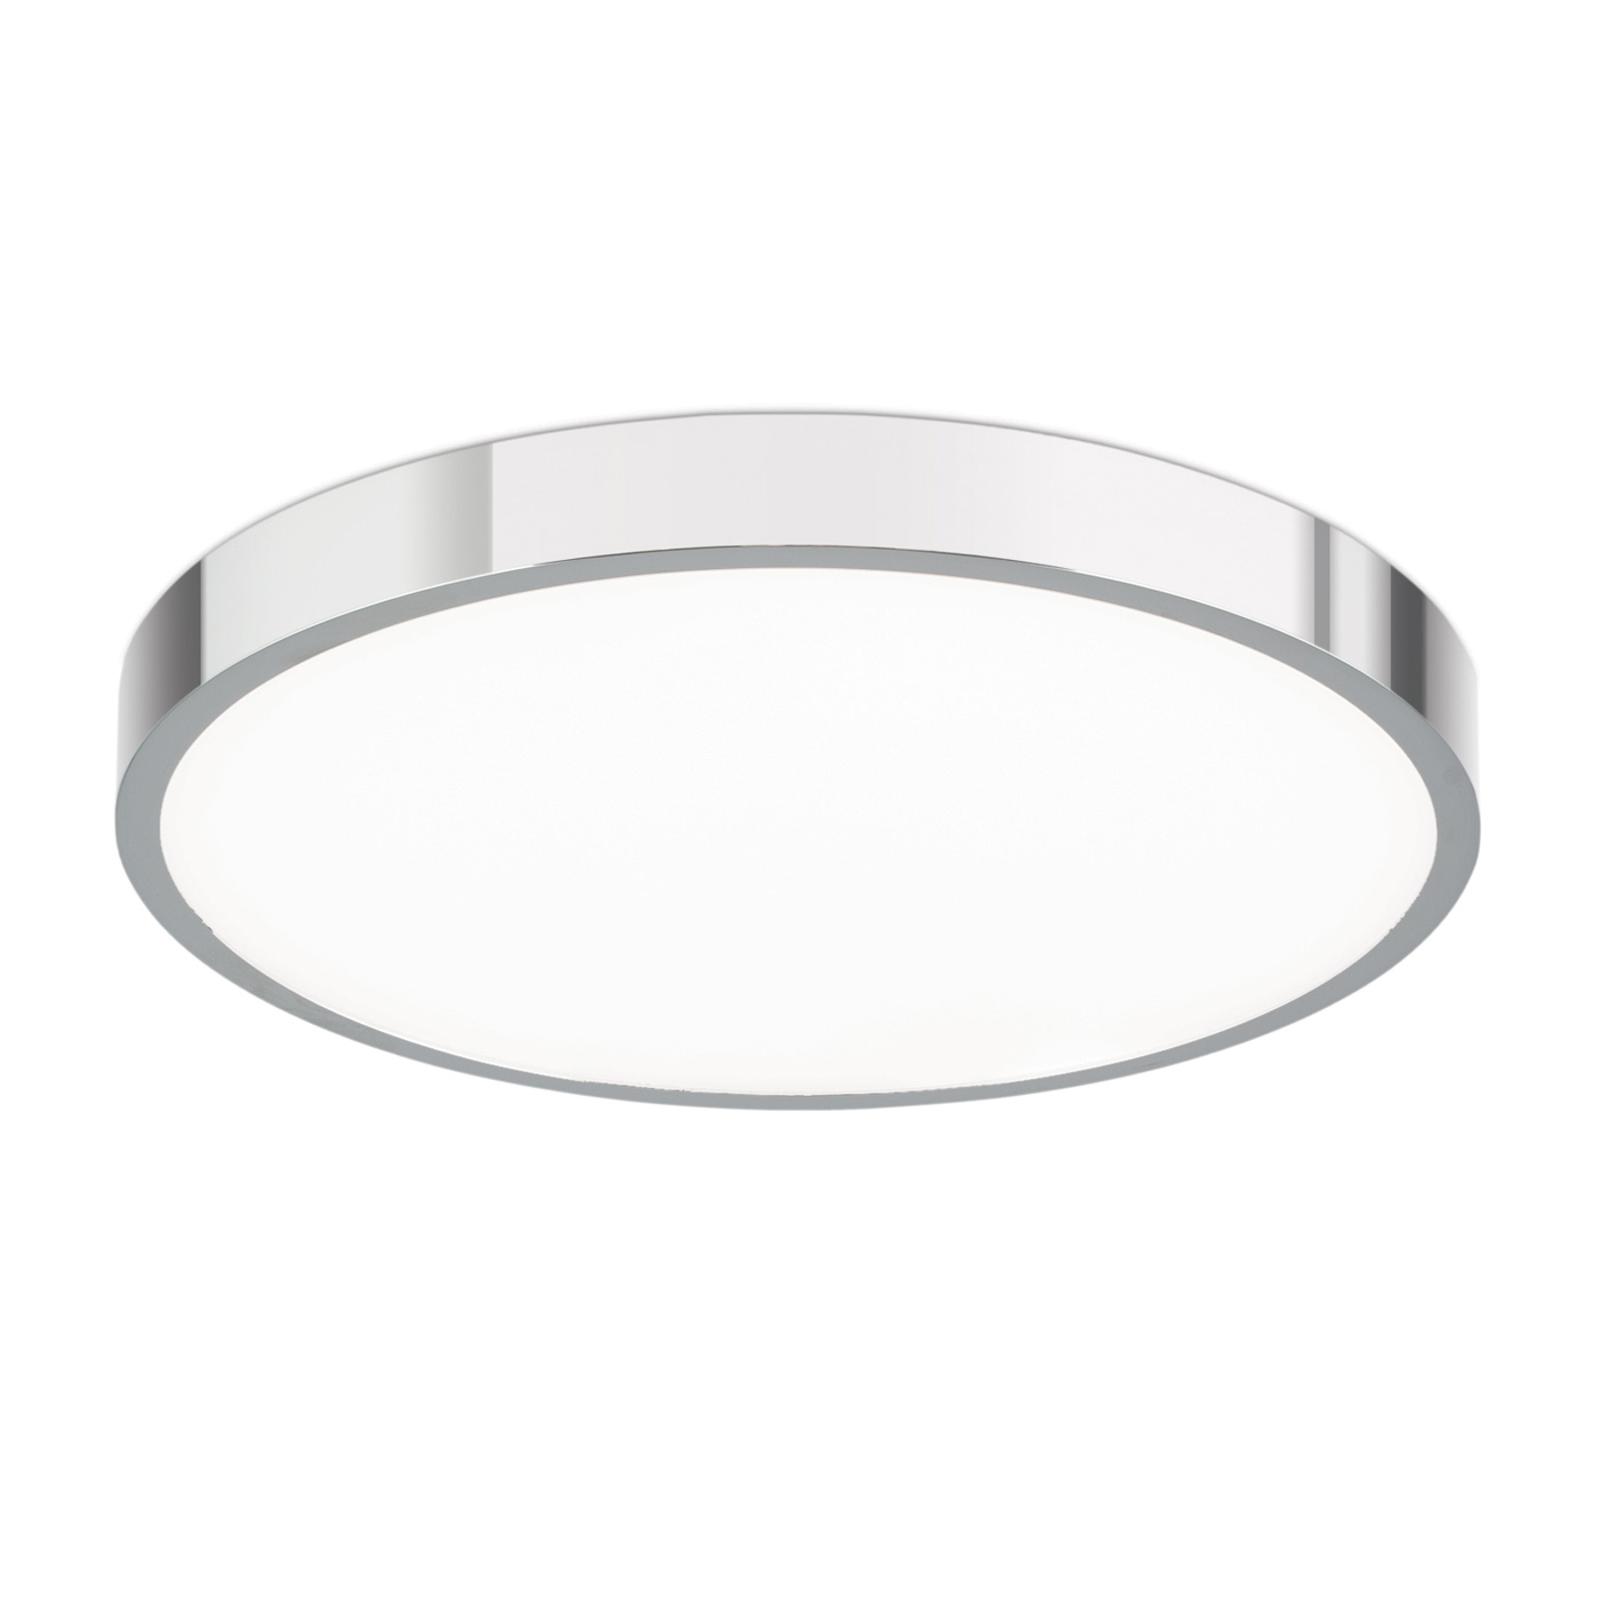 Lampa sufitowa LED Bully, chrom 24 cm